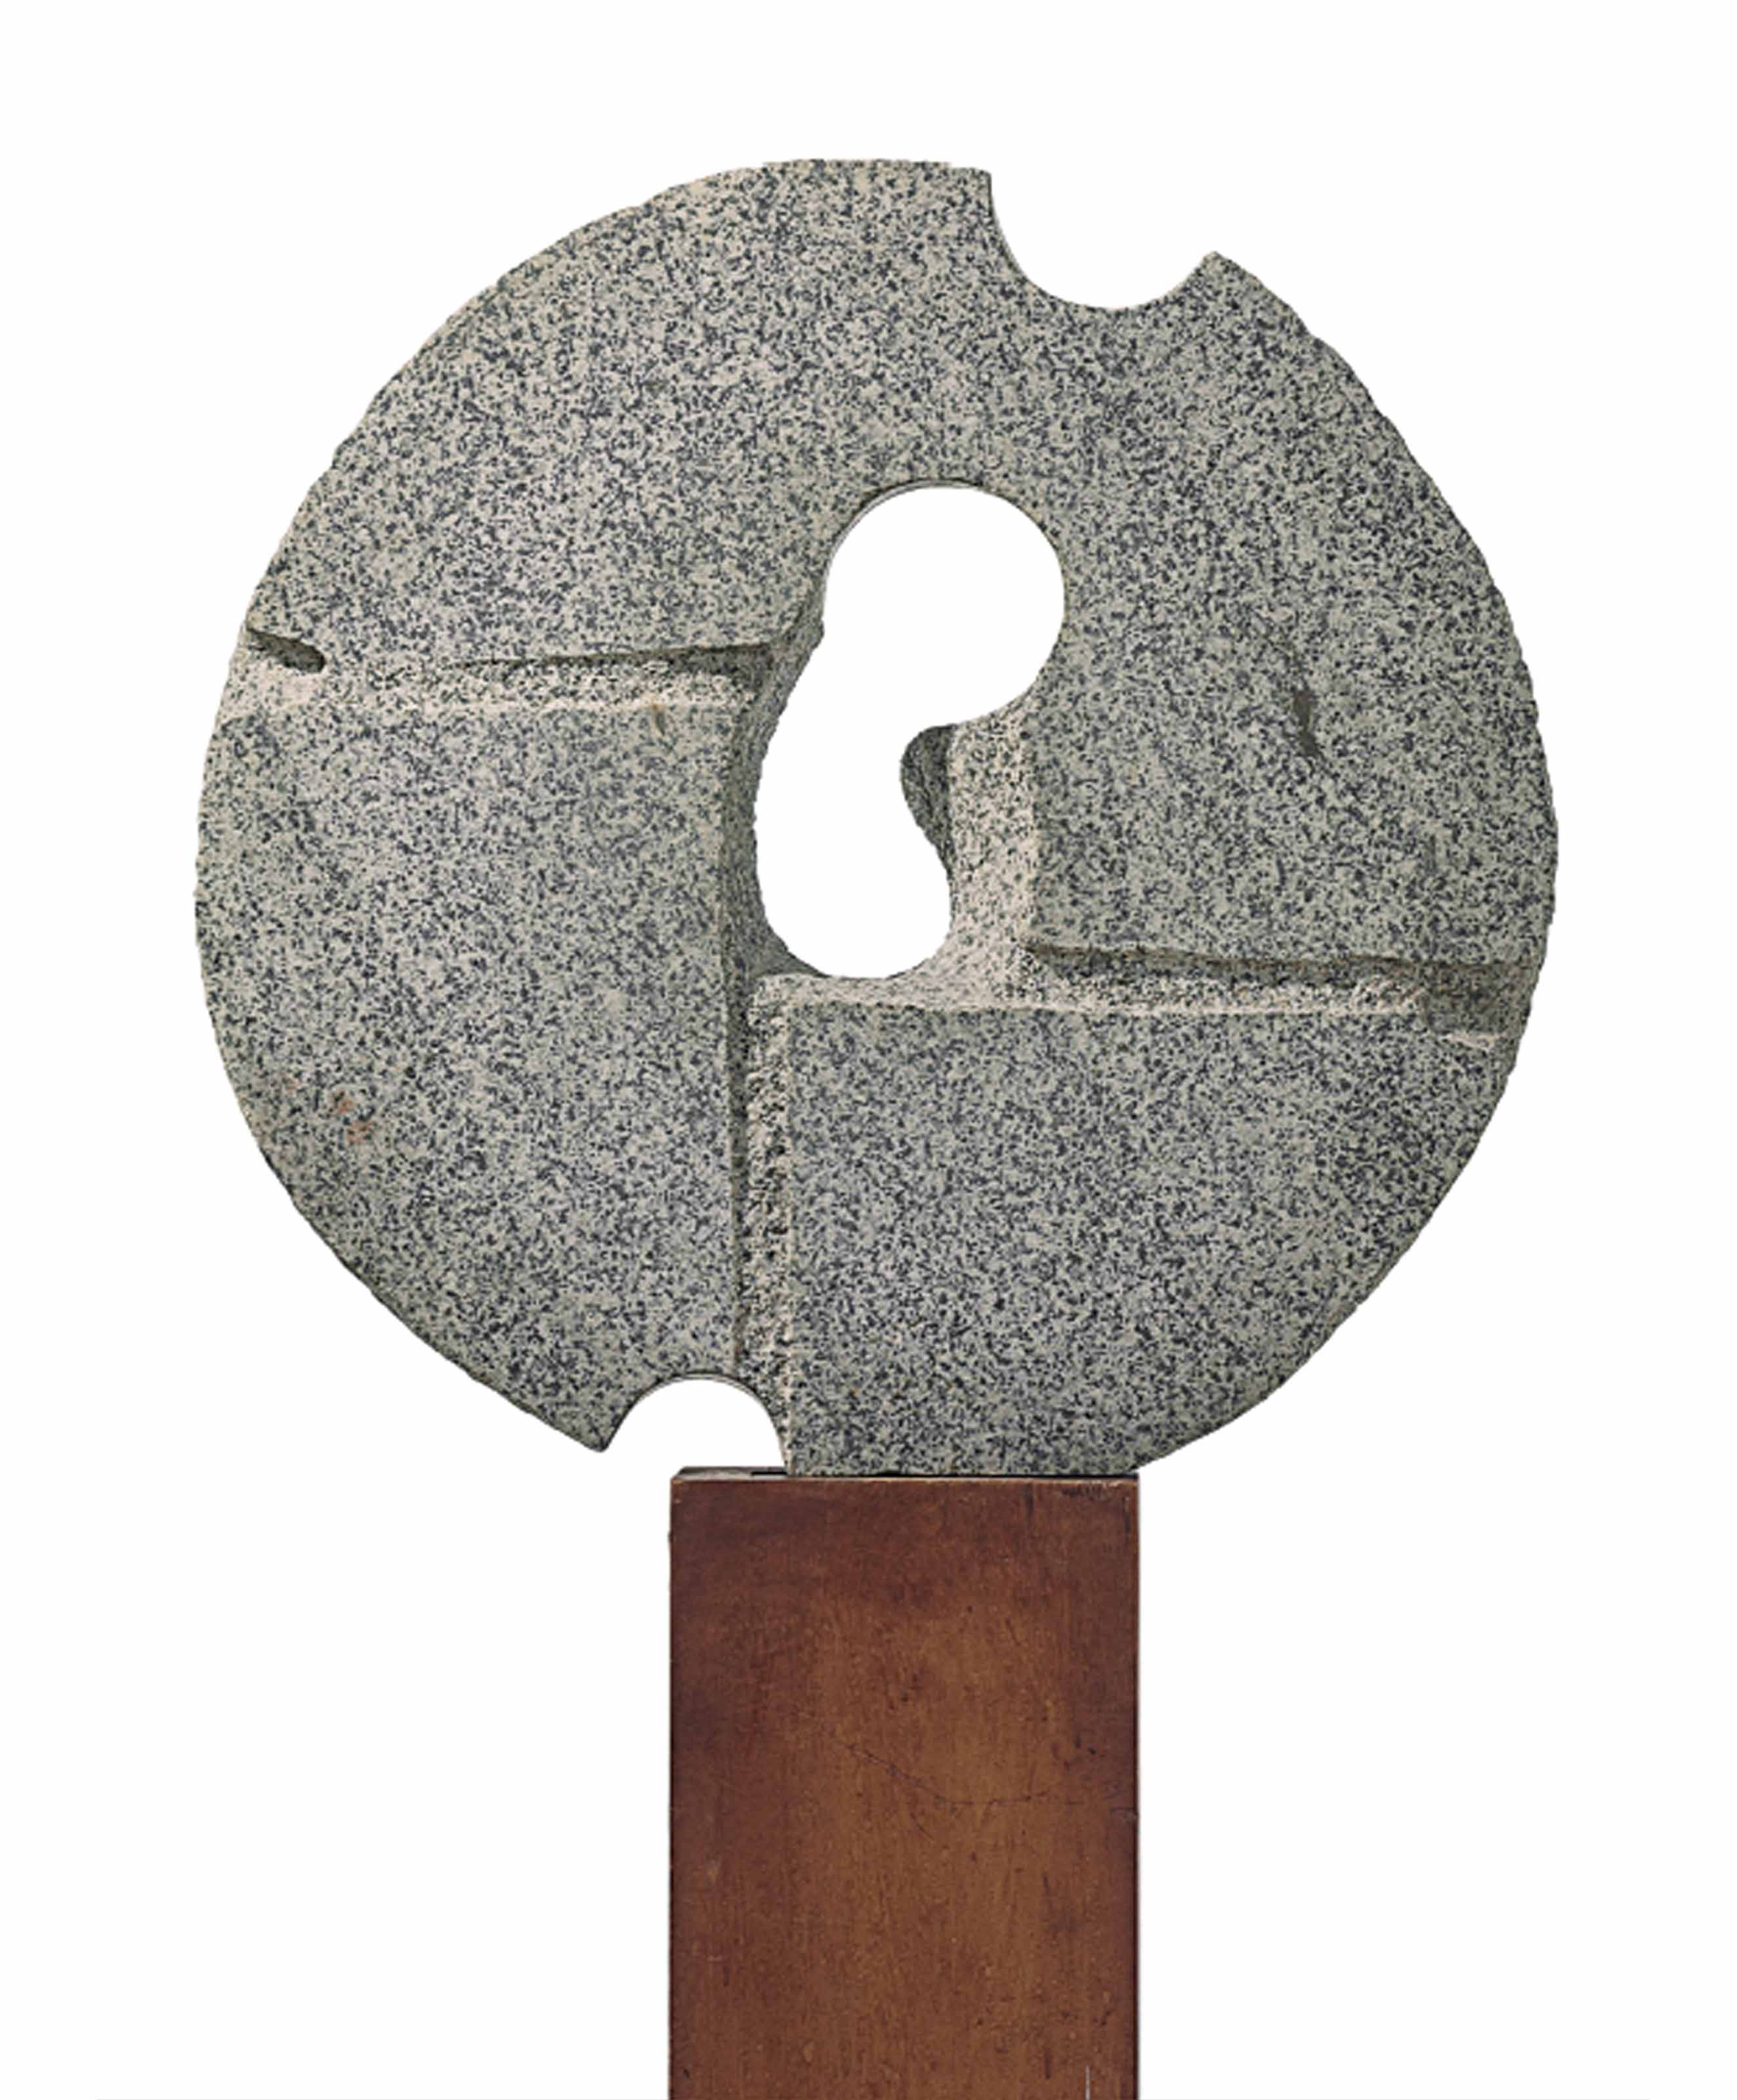 Variation on a Millstone #5